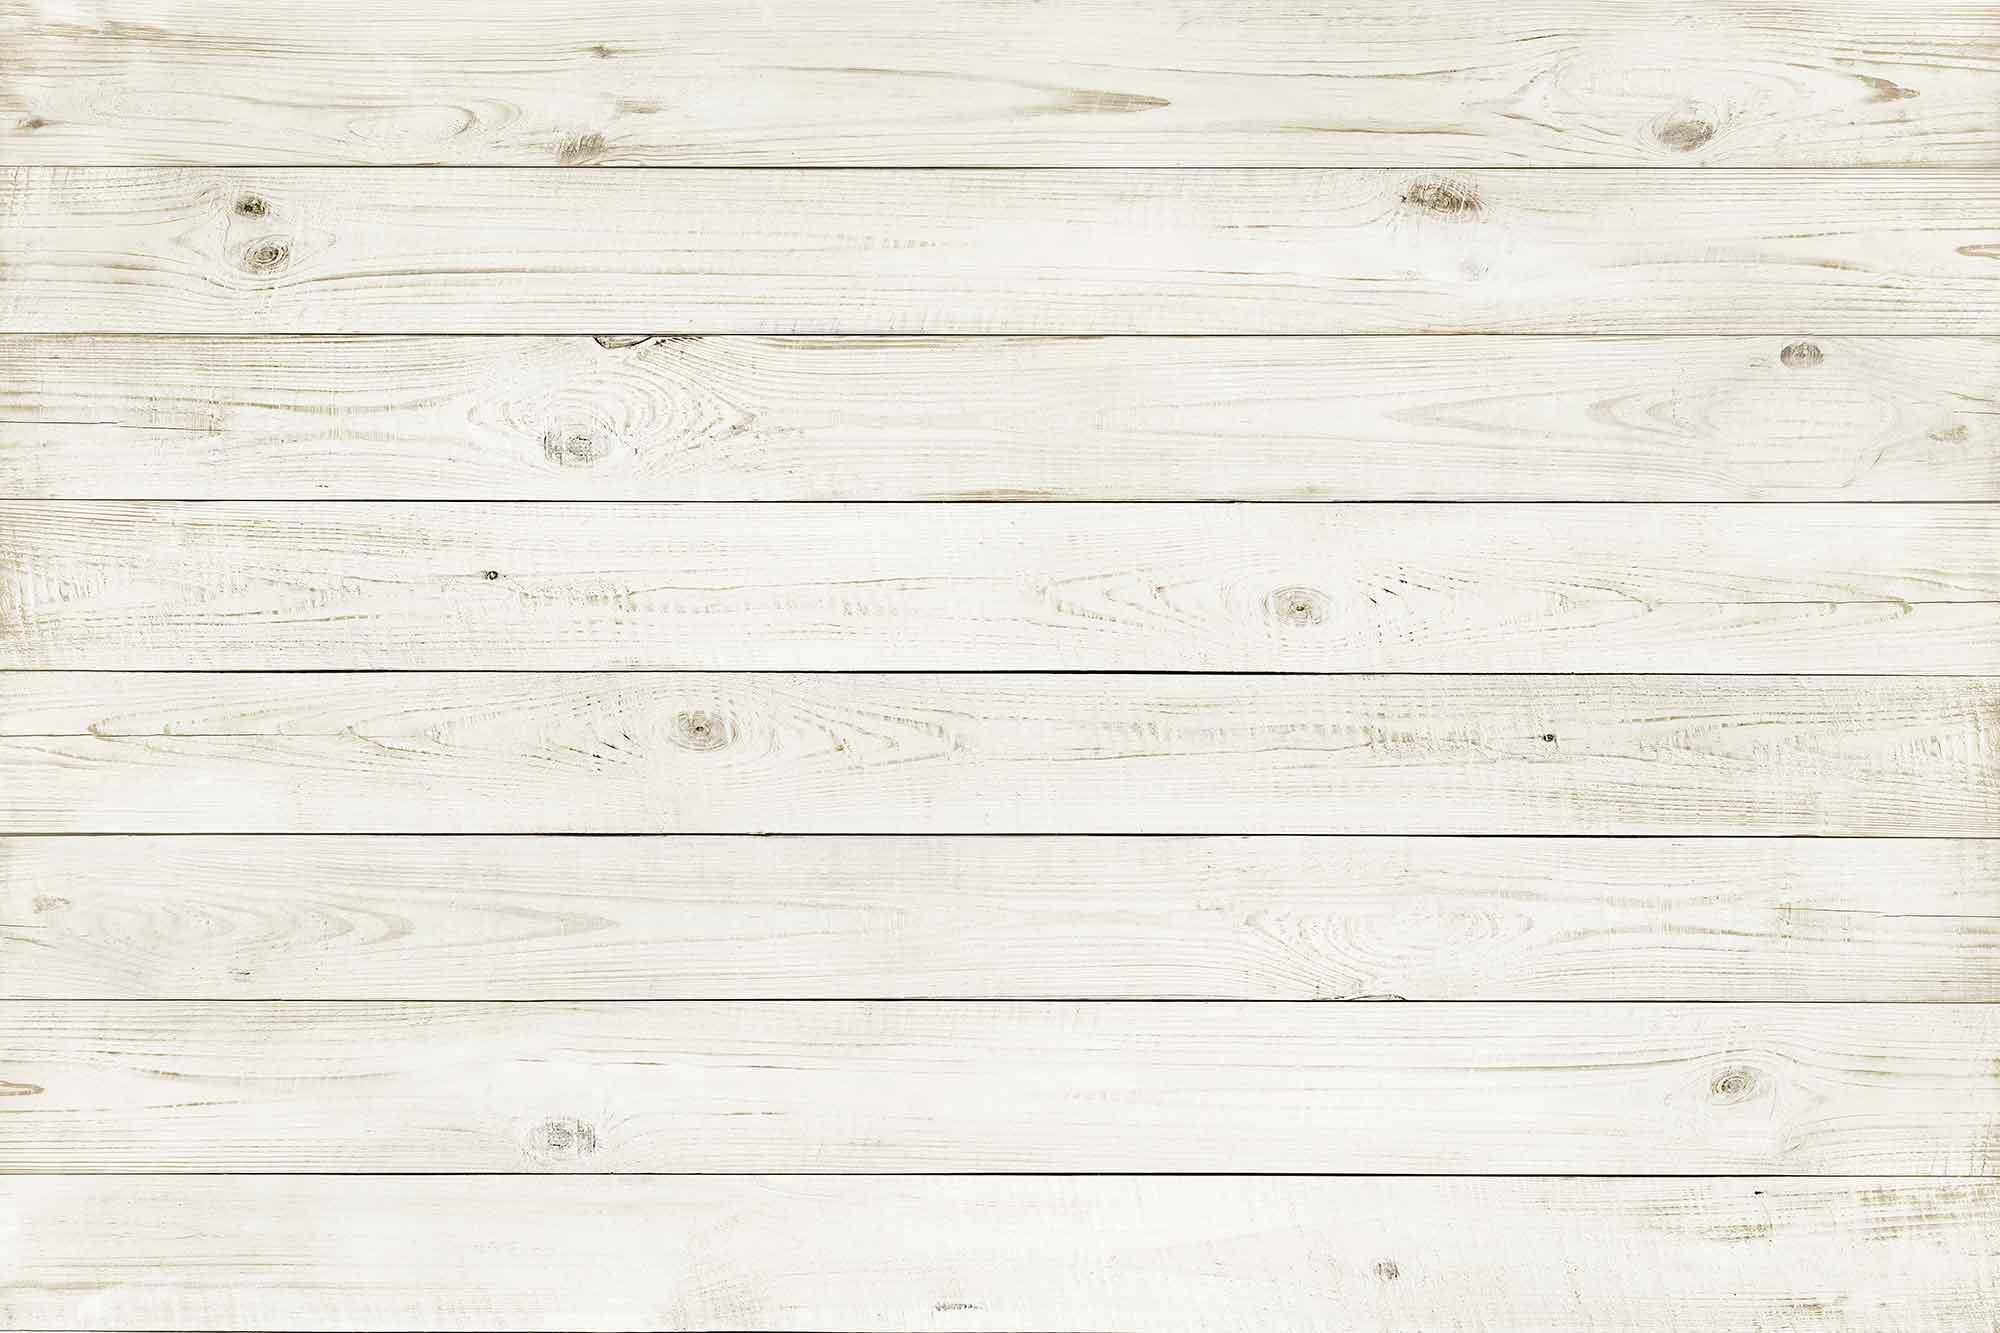 5 Light Wood Backgrounds JPG 2000x1333